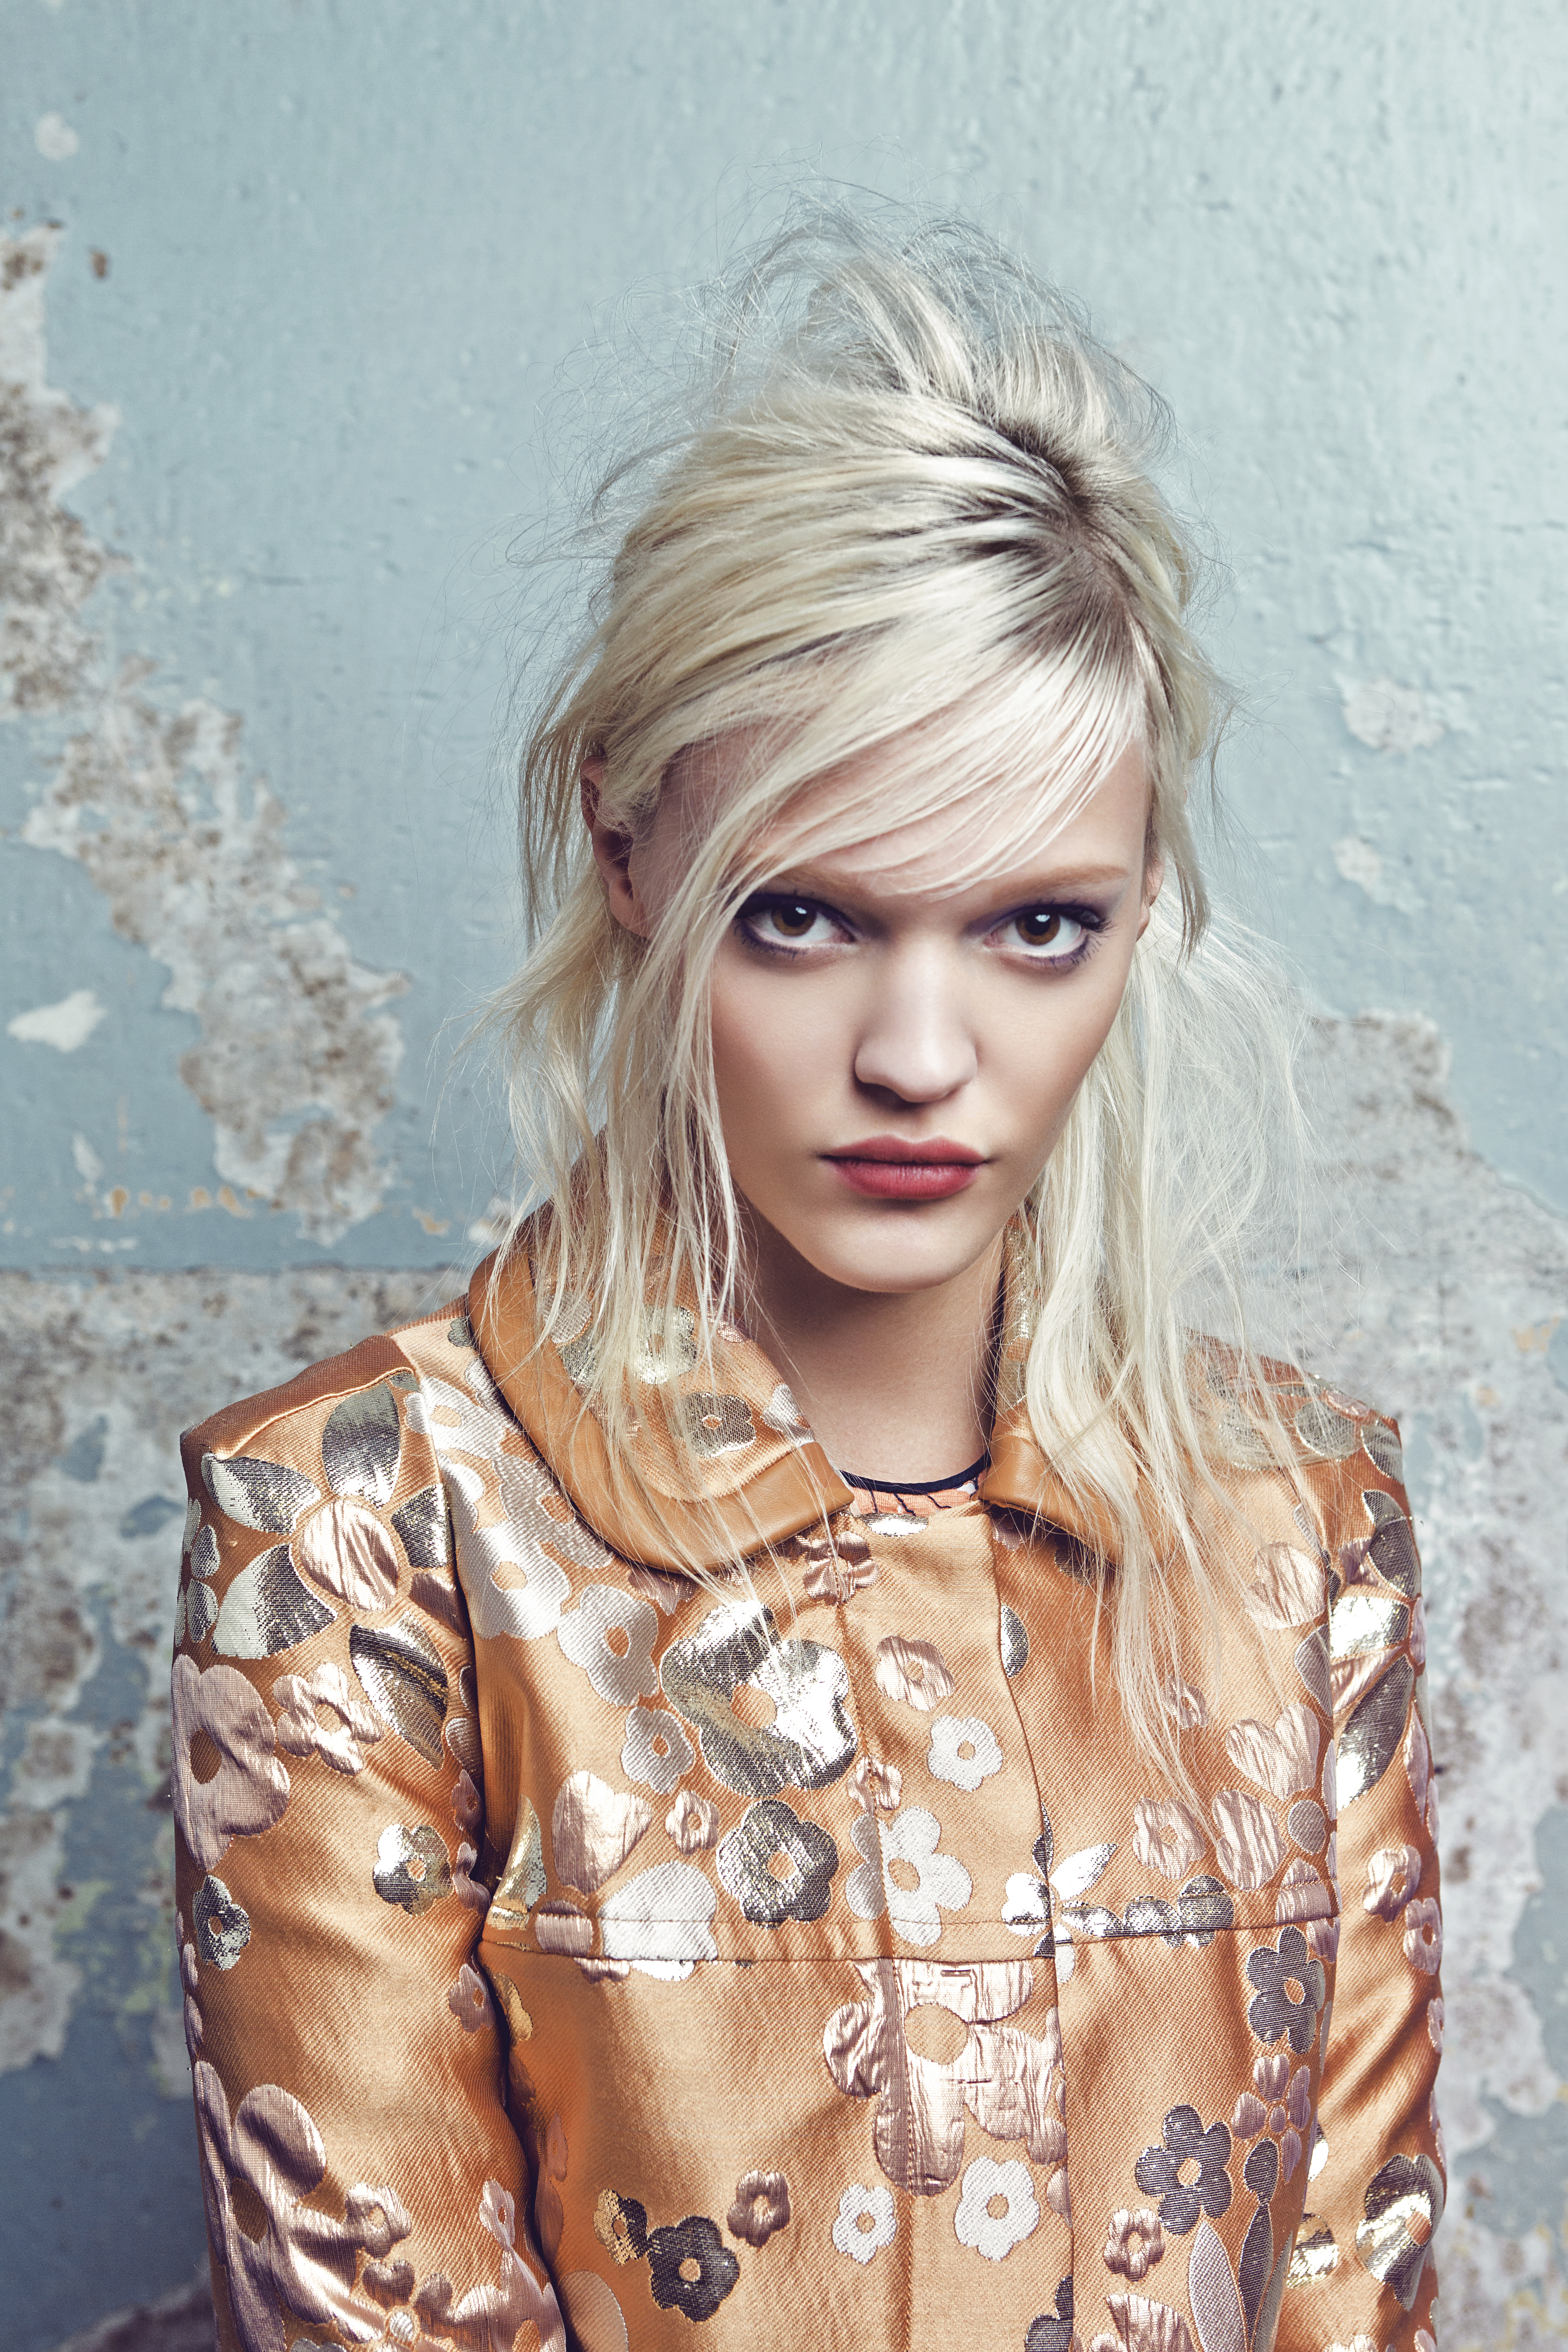 Make-up by Dani Guinsberg